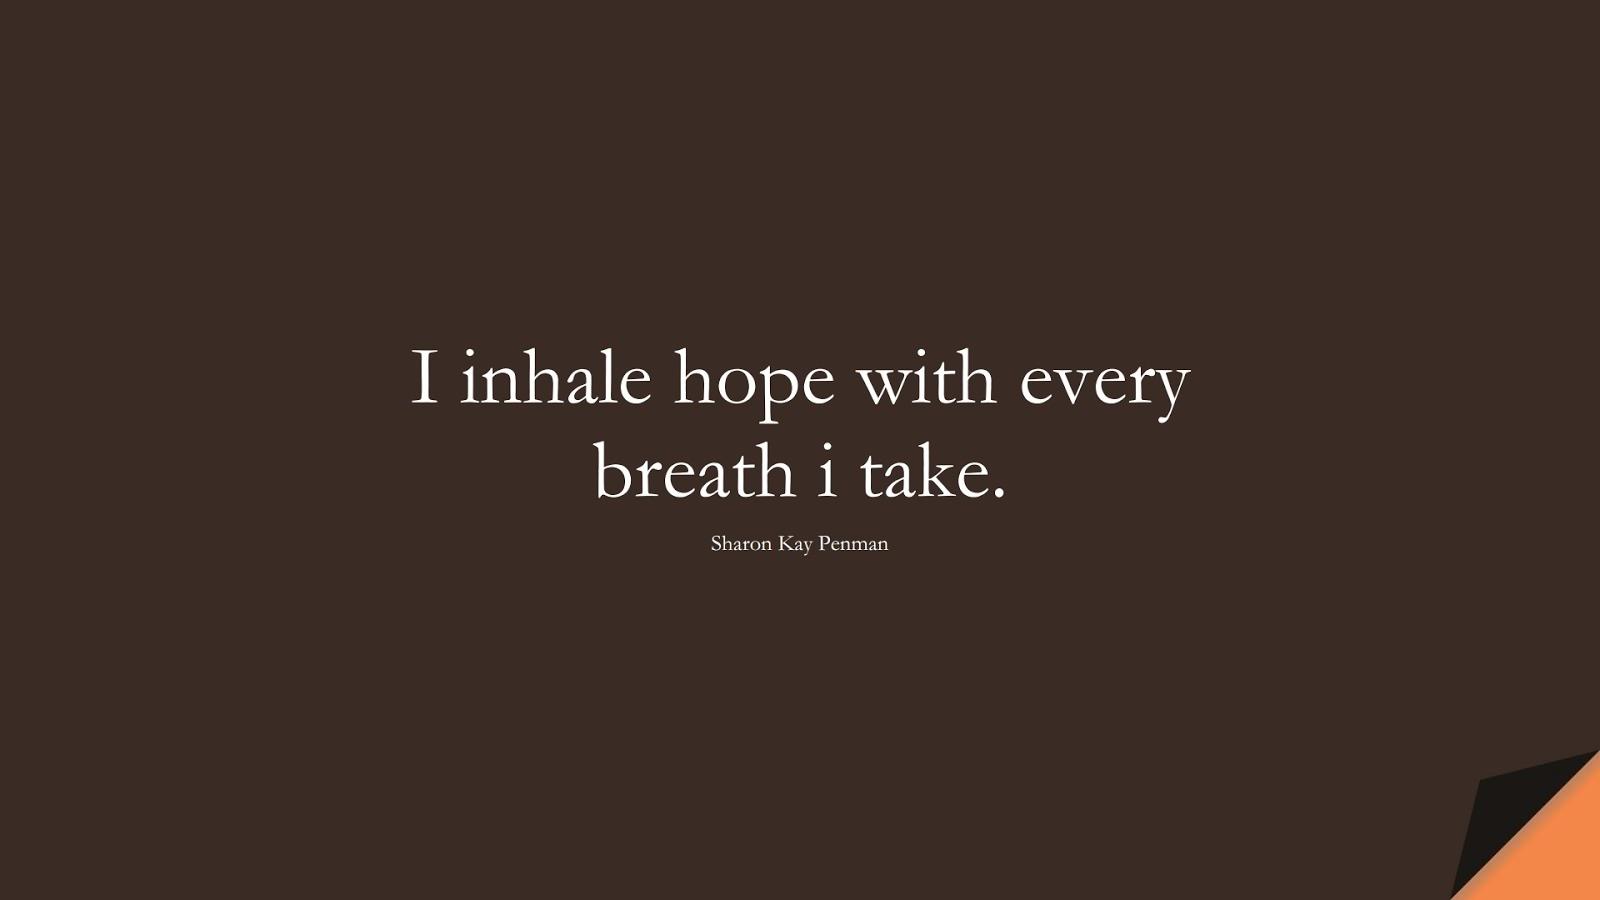 I inhale hope with every breath i take. (Sharon Kay Penman);  #HopeQuotes